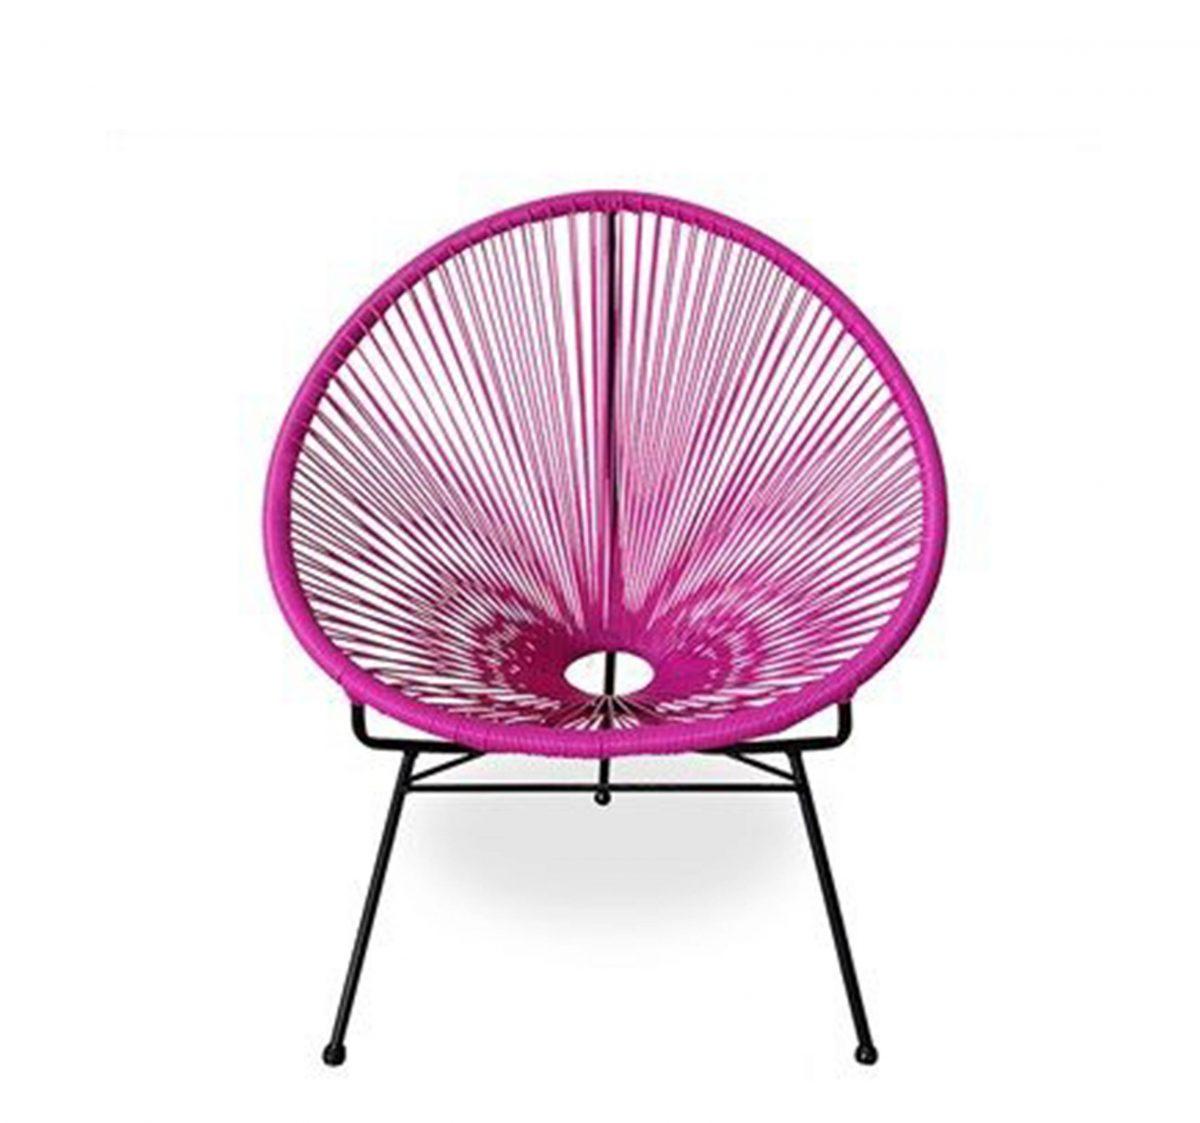 6. Acapulco outdoor chair